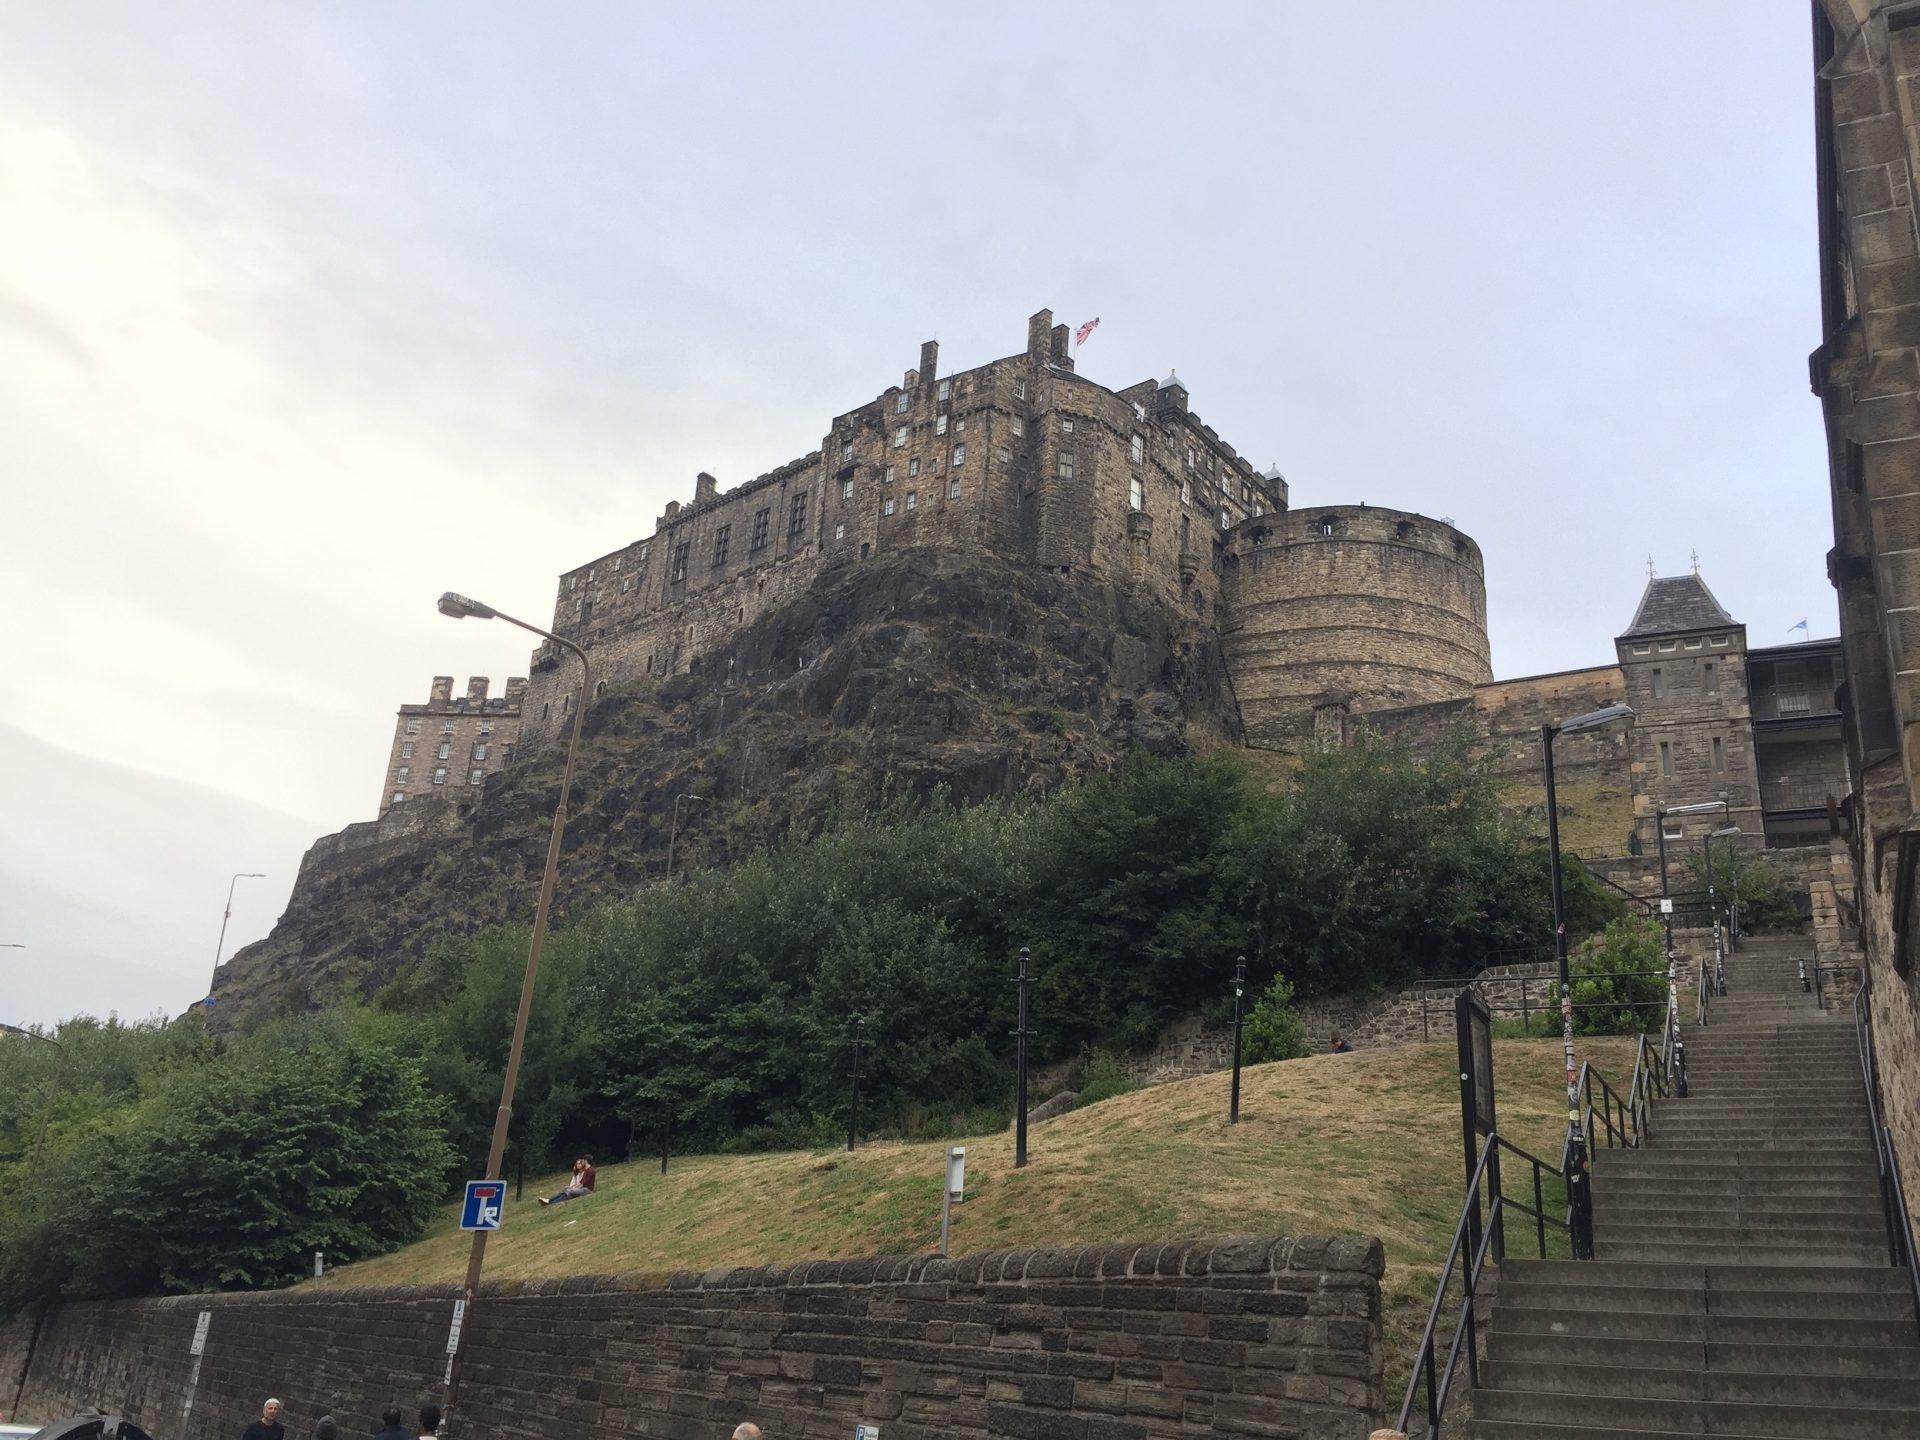 Edinburgh Castle – Das imposante Schloss in Schottlands Hauptstadt